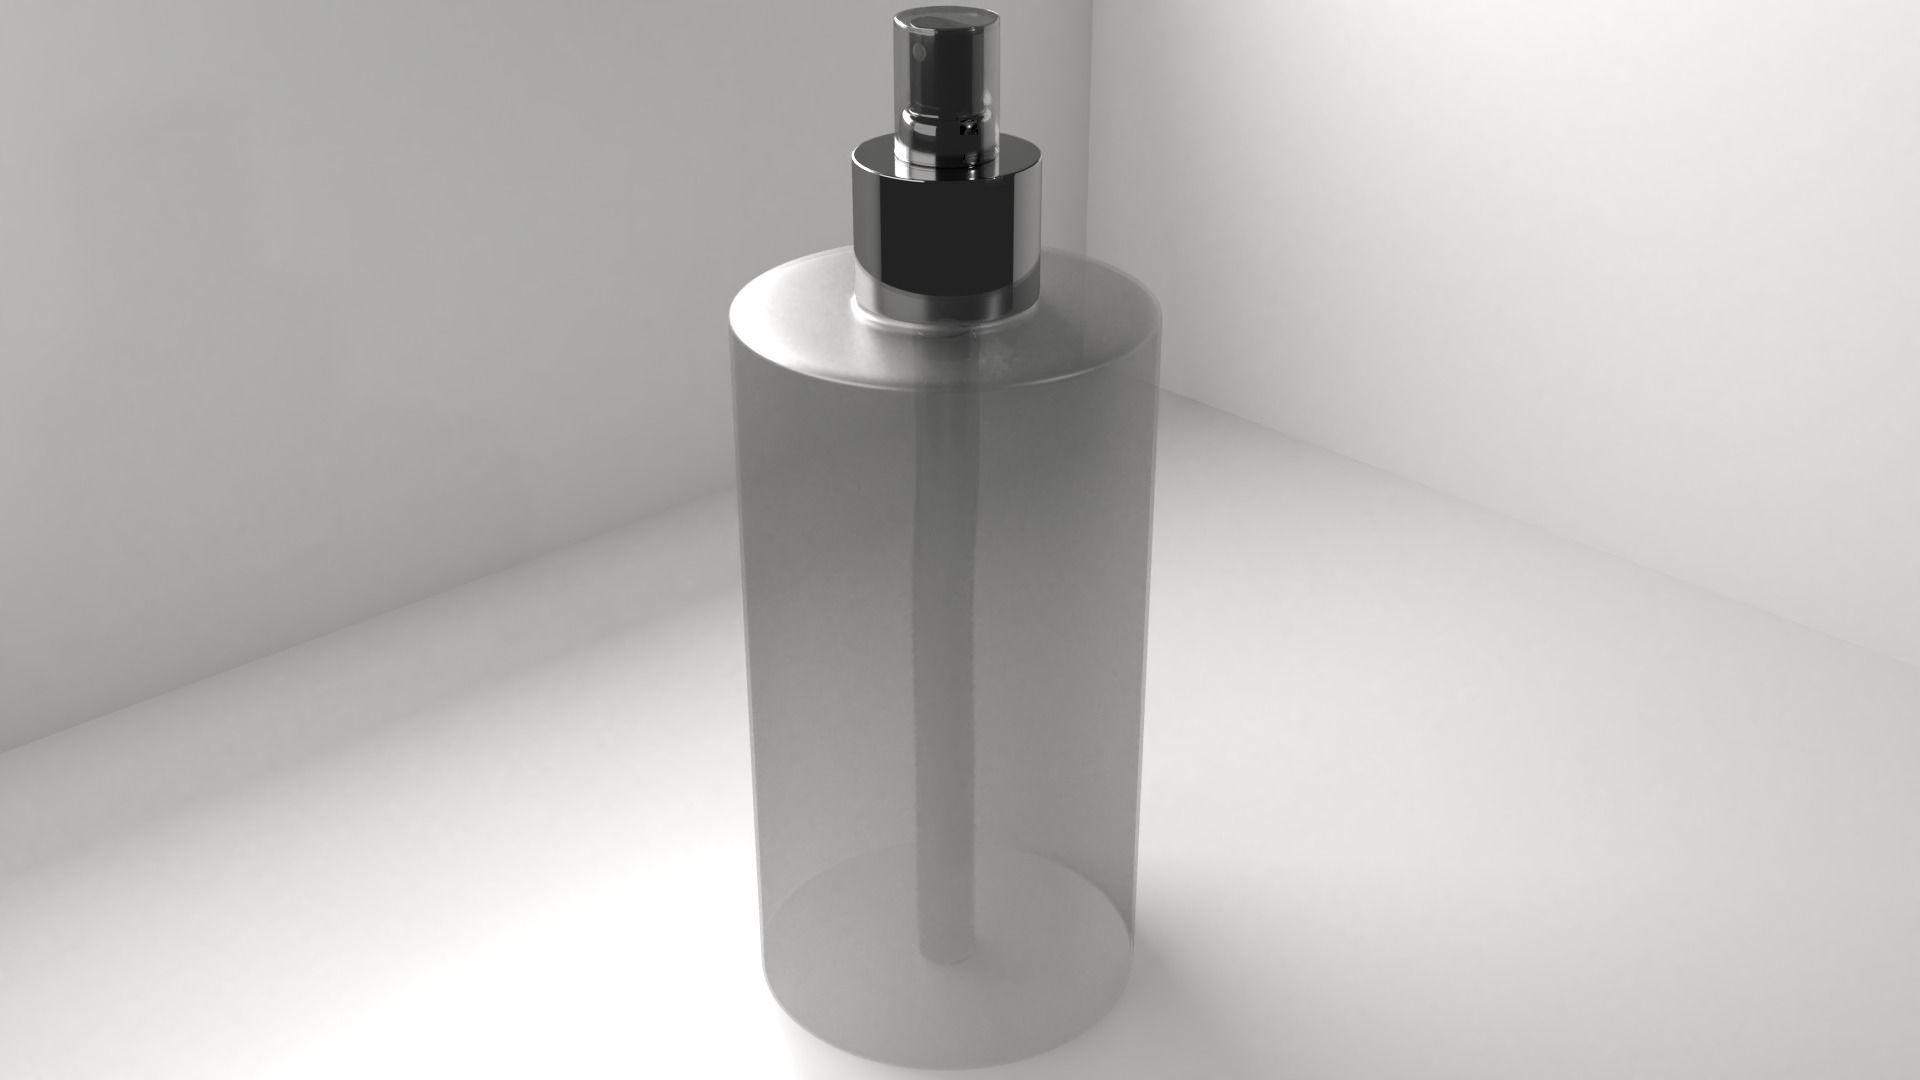 Spray Bottle 1 - Body Mist Bottle